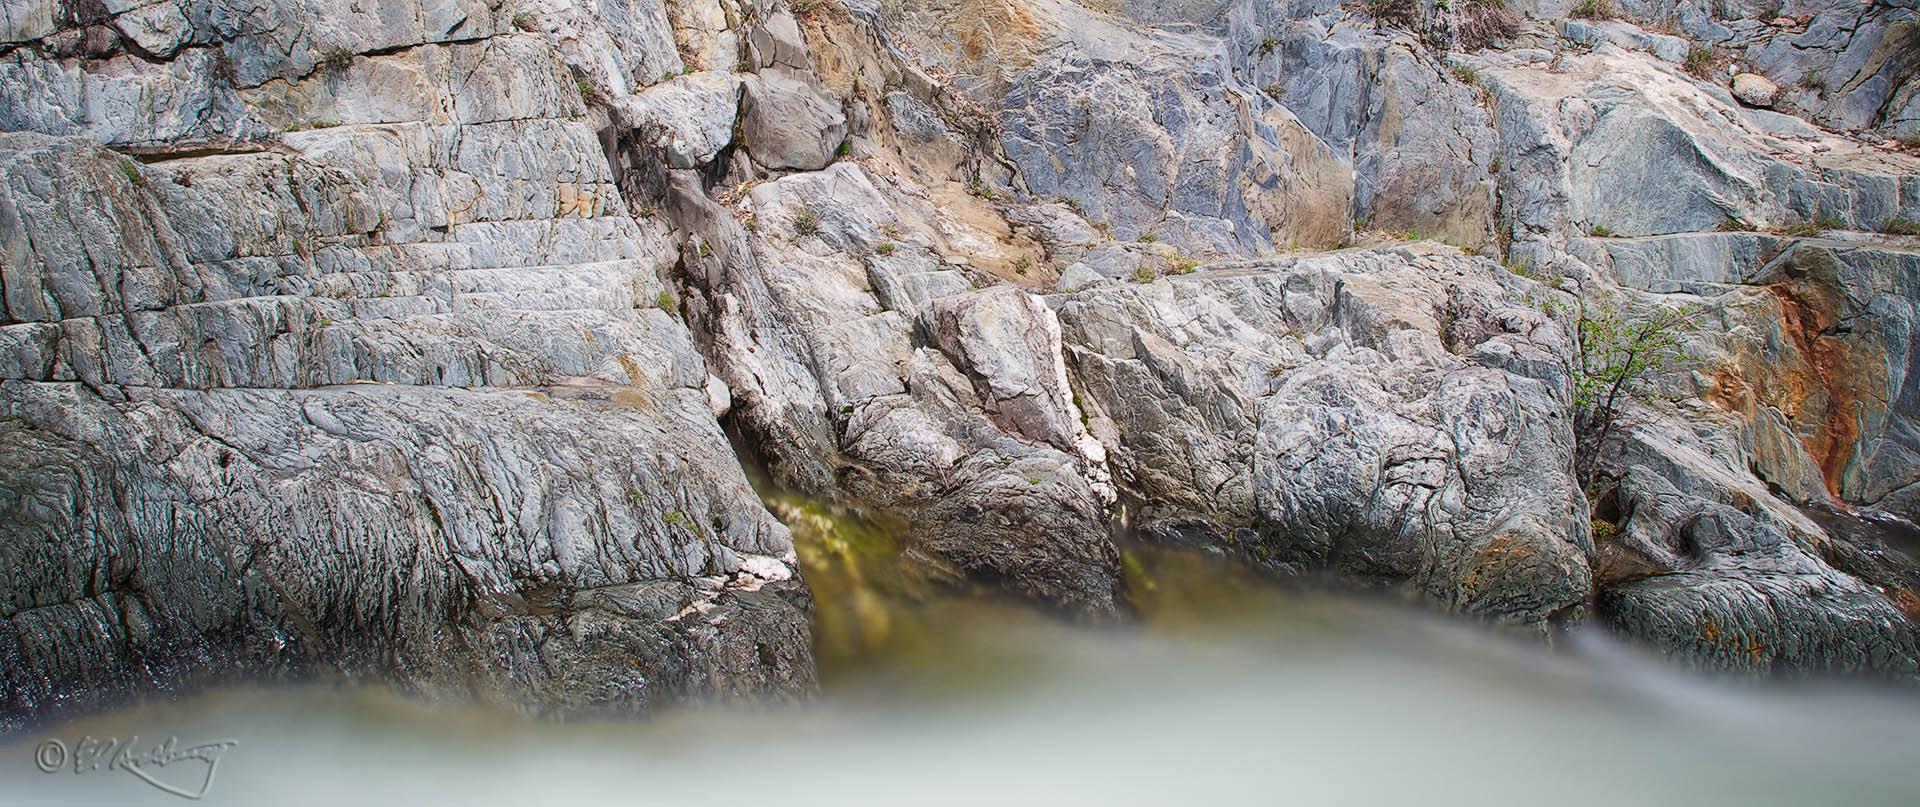 Canyon_Creek_Wall-c91